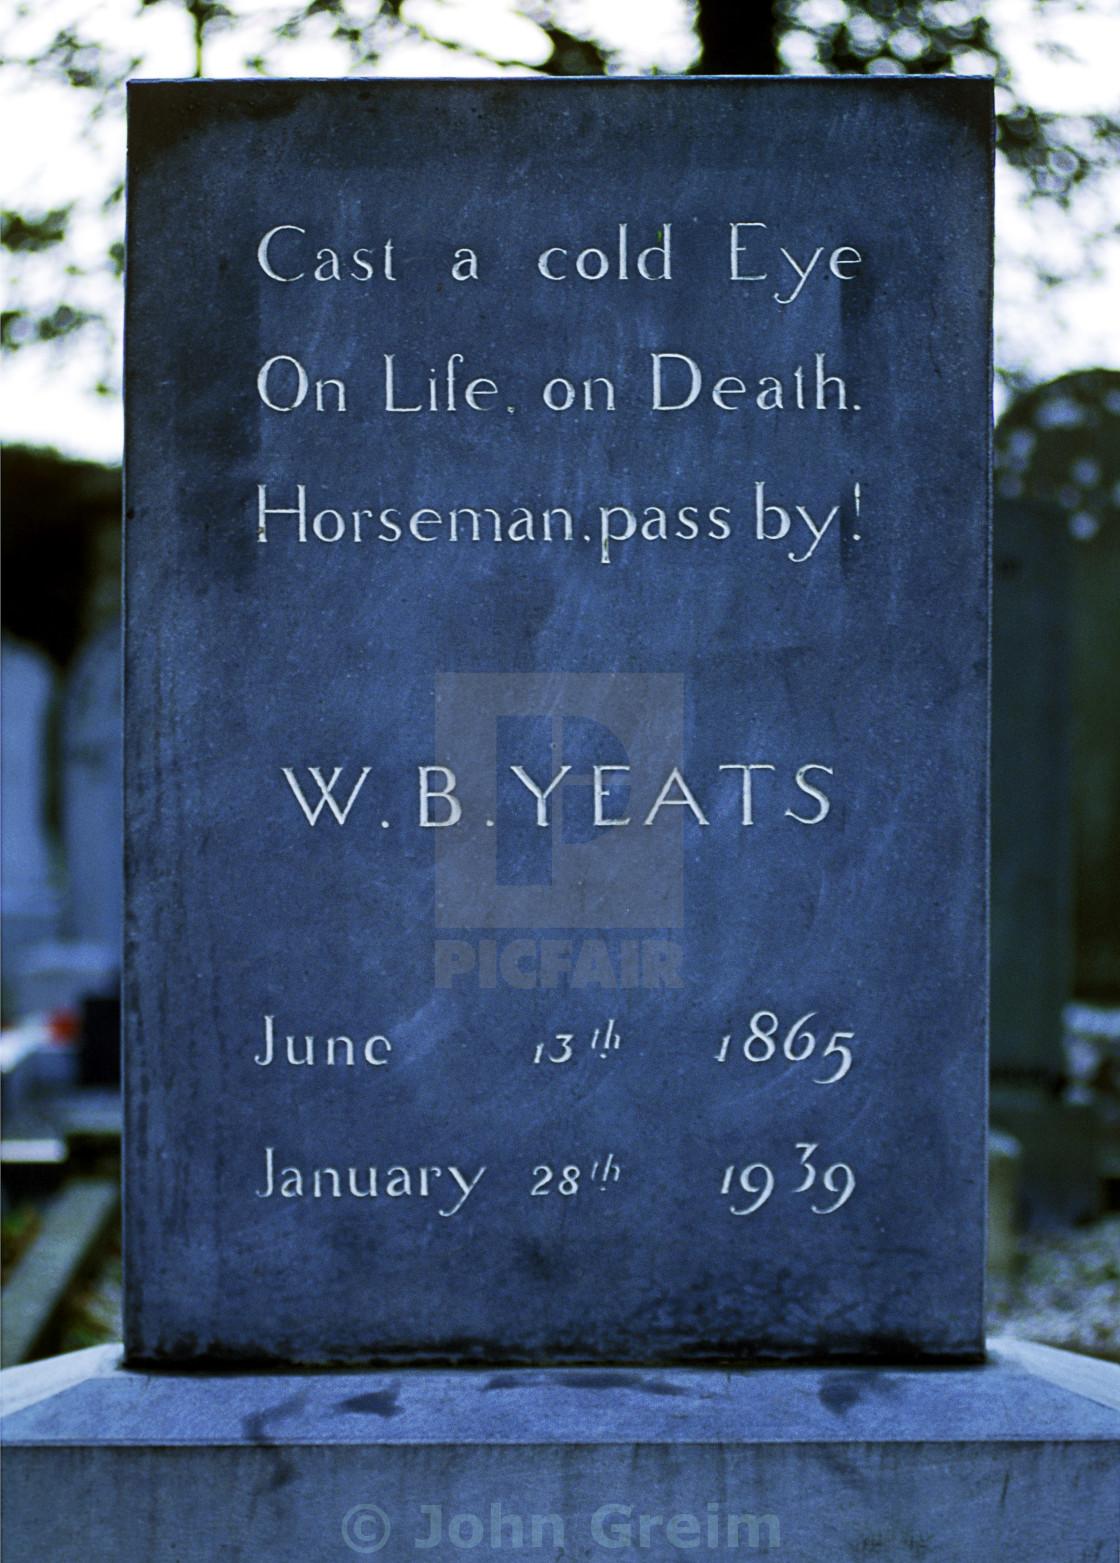 wb yeats as an irish poet